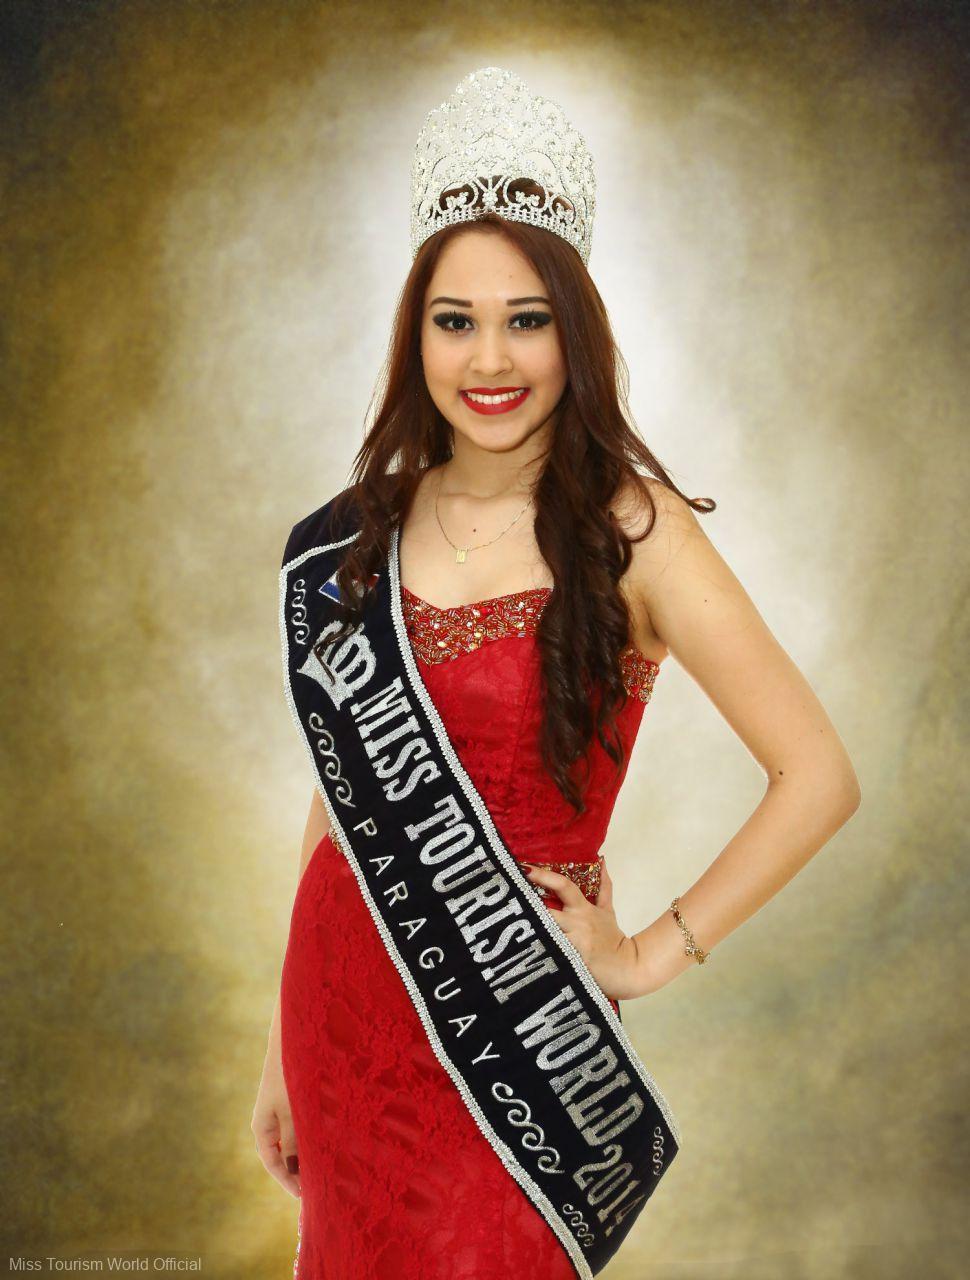 Miss Tourism Paraguay 2014 | Miss Tourism World - official